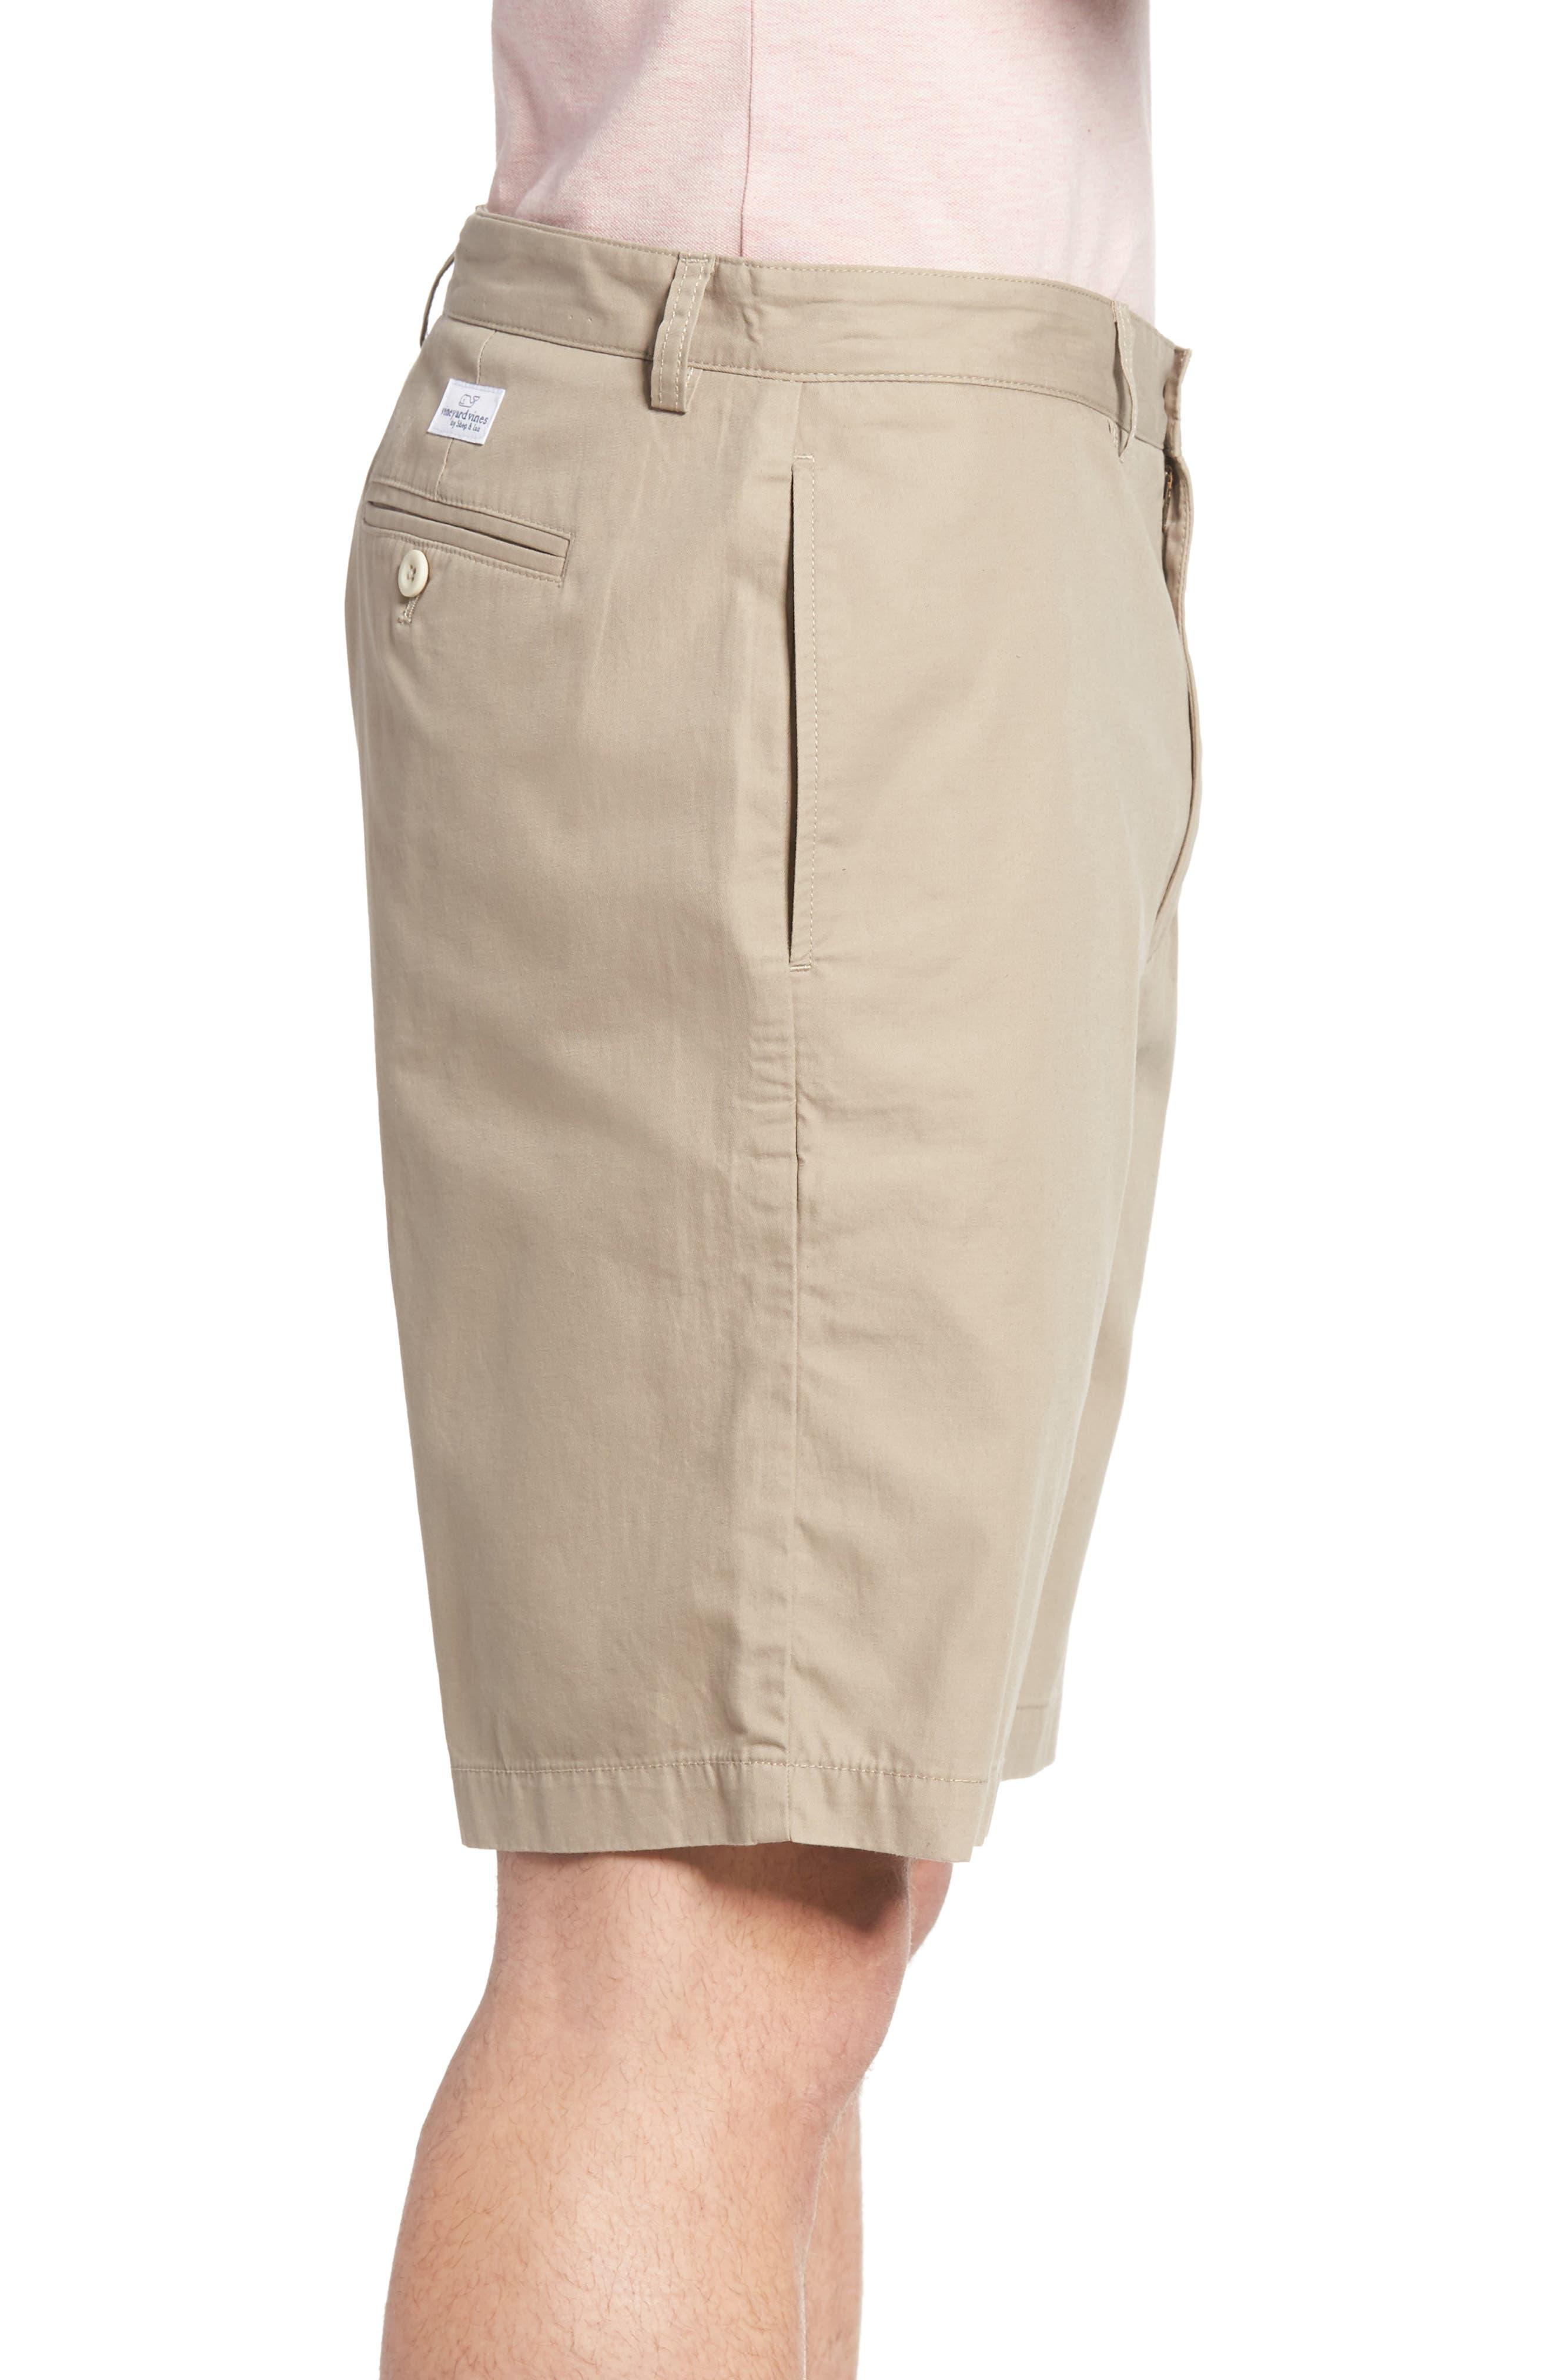 9 Inch Stretch Breaker Shorts,                             Alternate thumbnail 58, color,